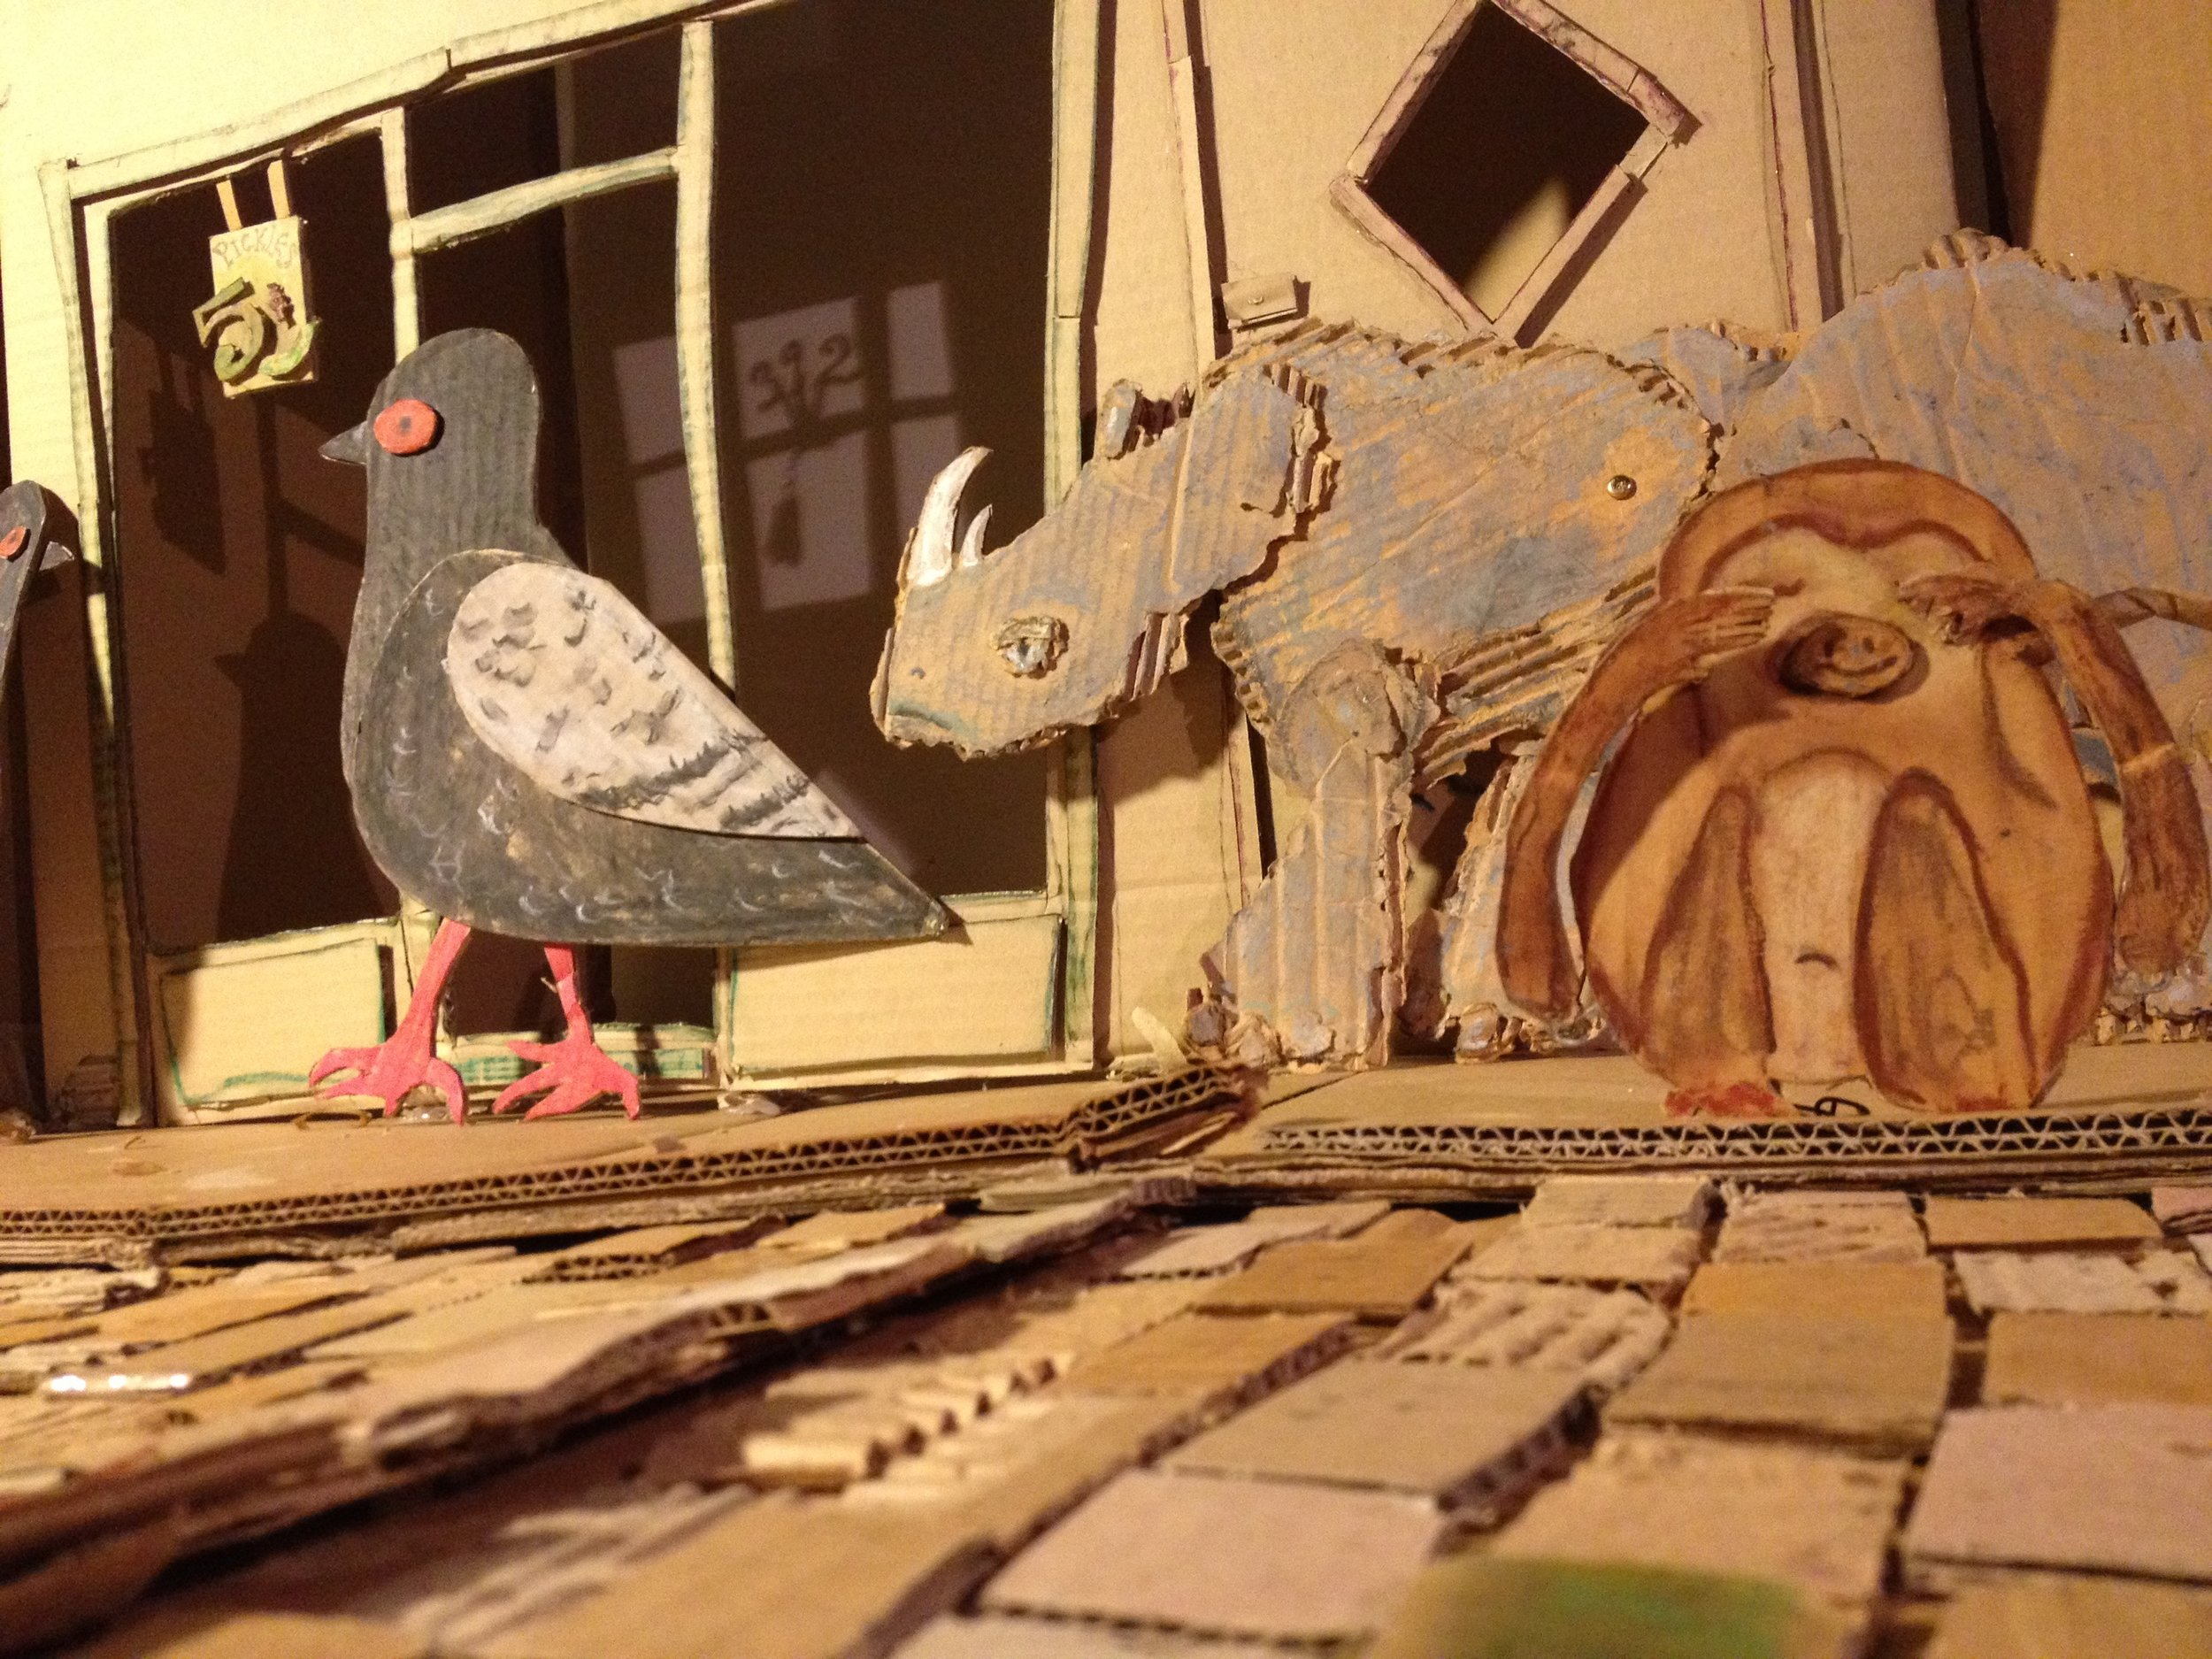 cardboard creatures.jpg